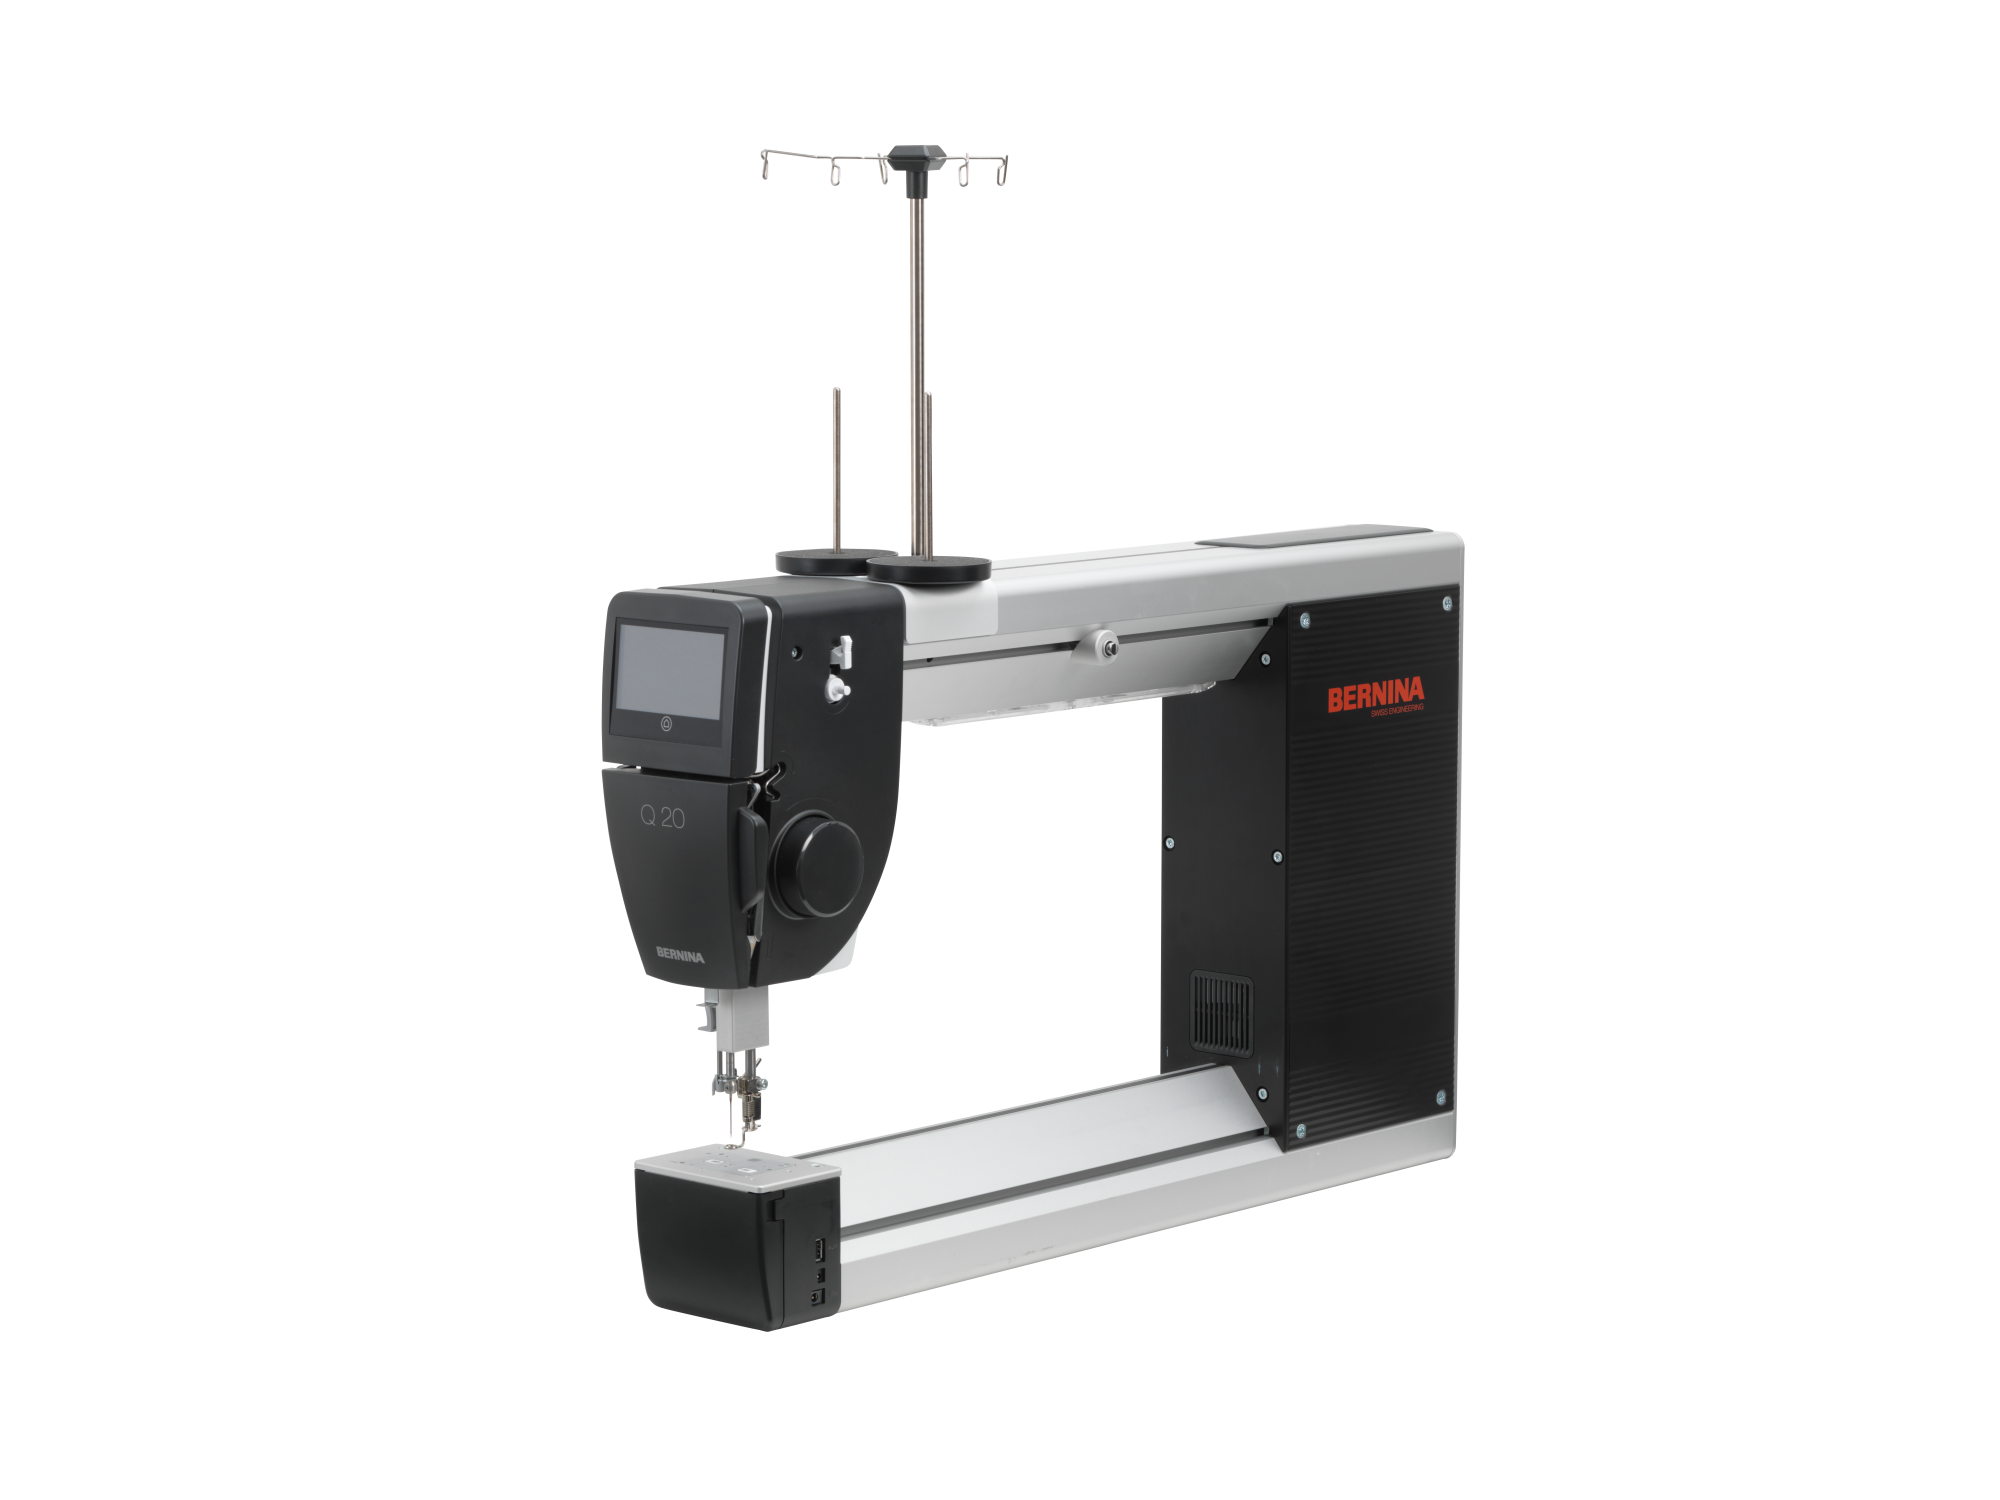 Bernina Q 20 Longarm Machine